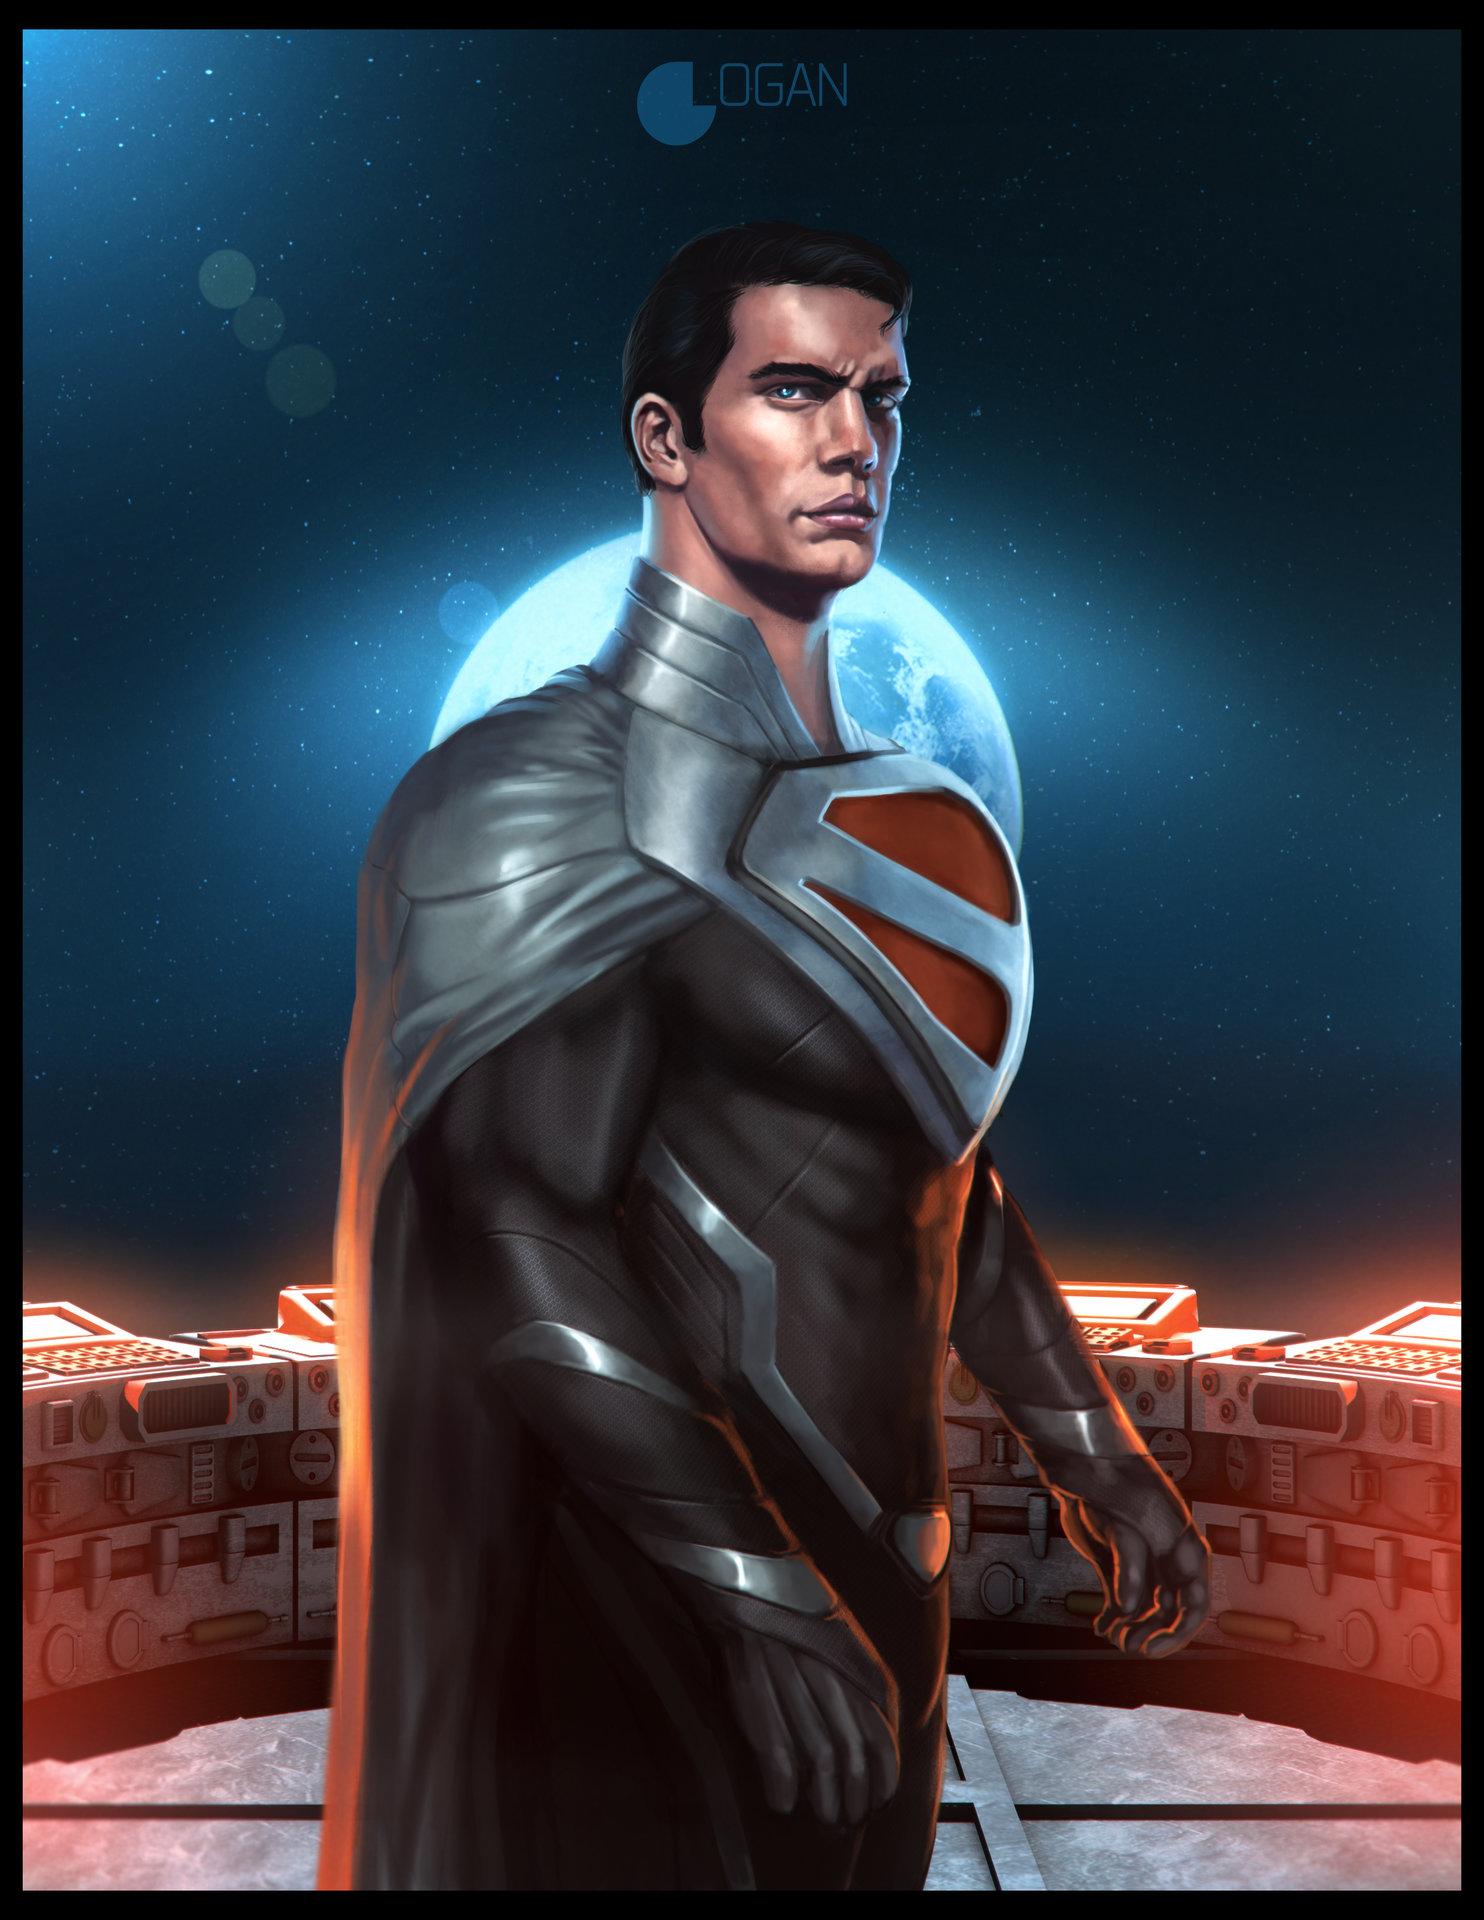 Charles logan superman justice lord full